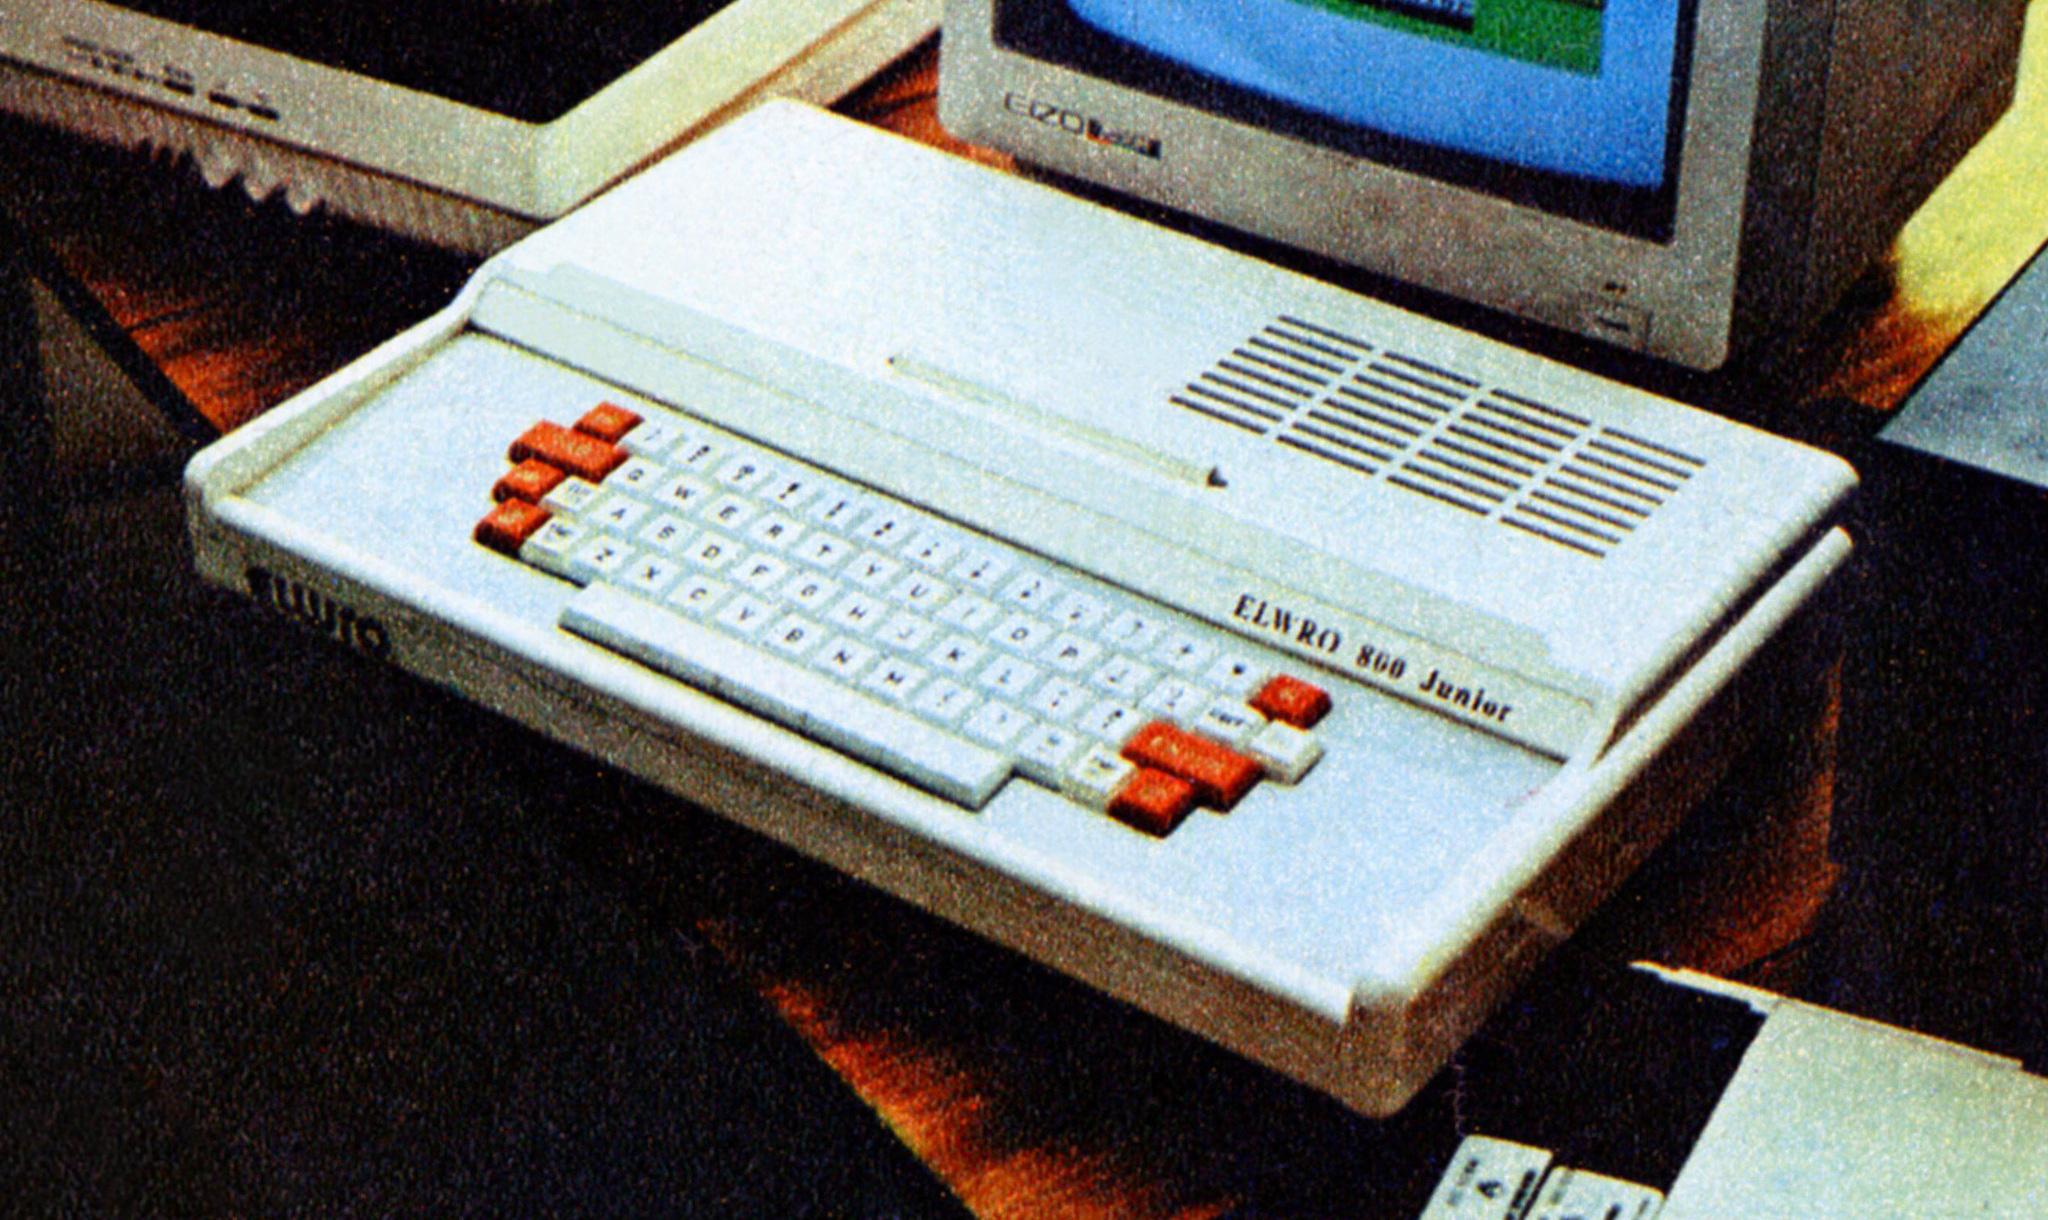 Polski mikrokomputer Elwro 800 Junior – Historia